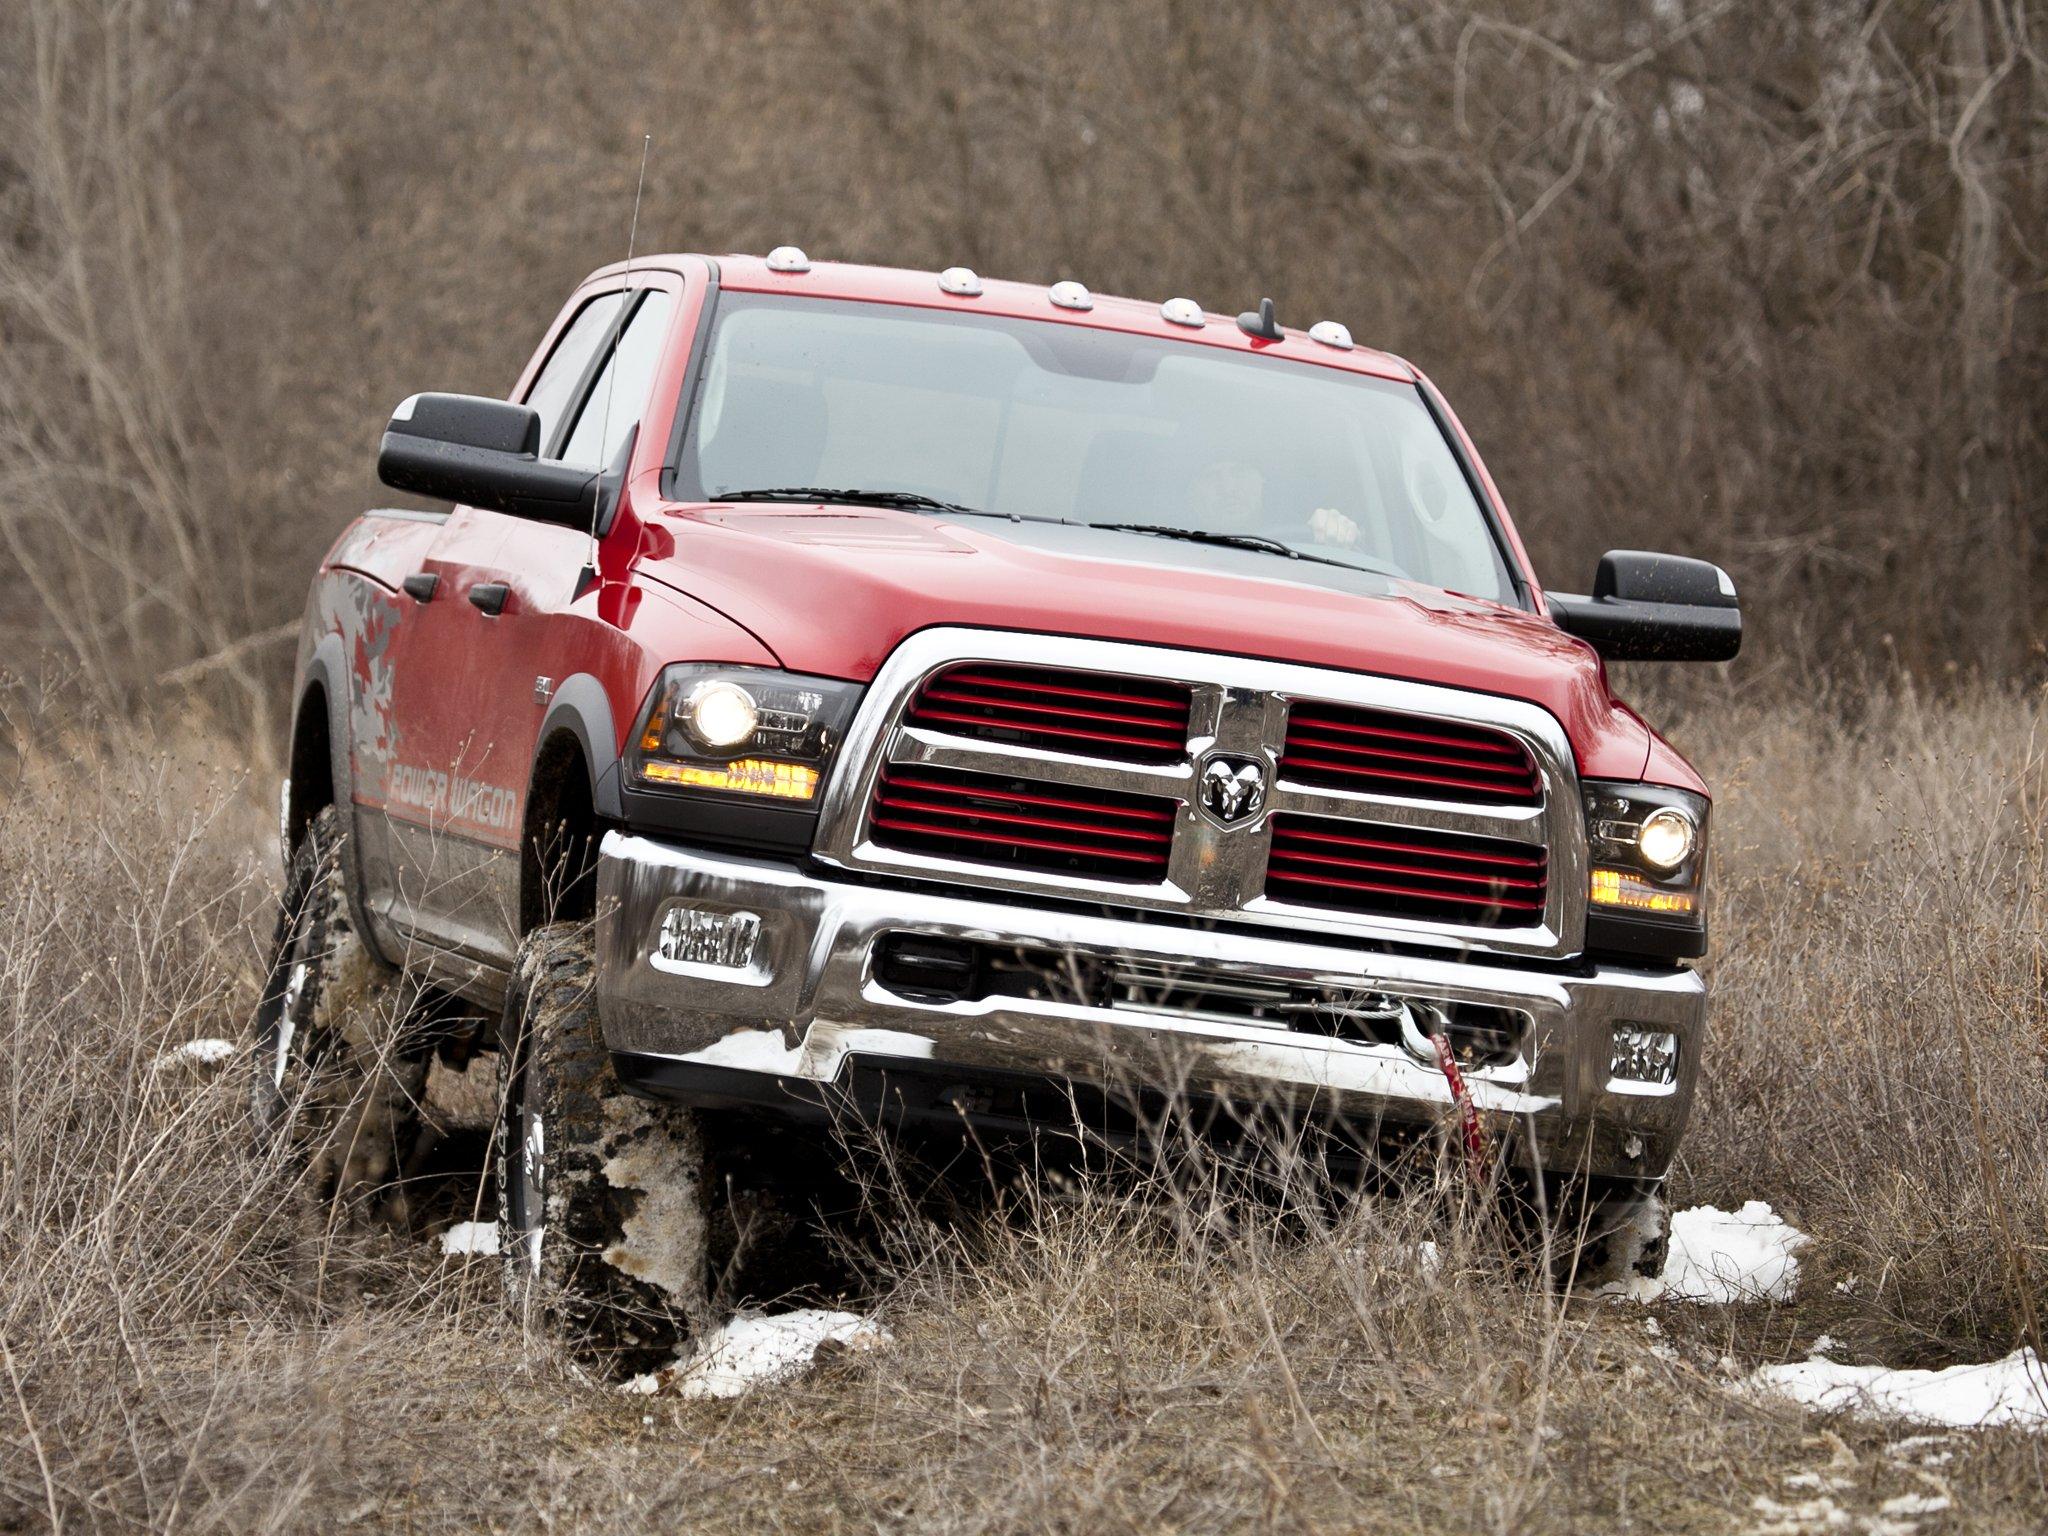 3C6LR5BT7EG298743 - 2014 Dodge Ram 2500 Macho Power Wagon ... |2014 Dodge Ram 2500 Power Wagon